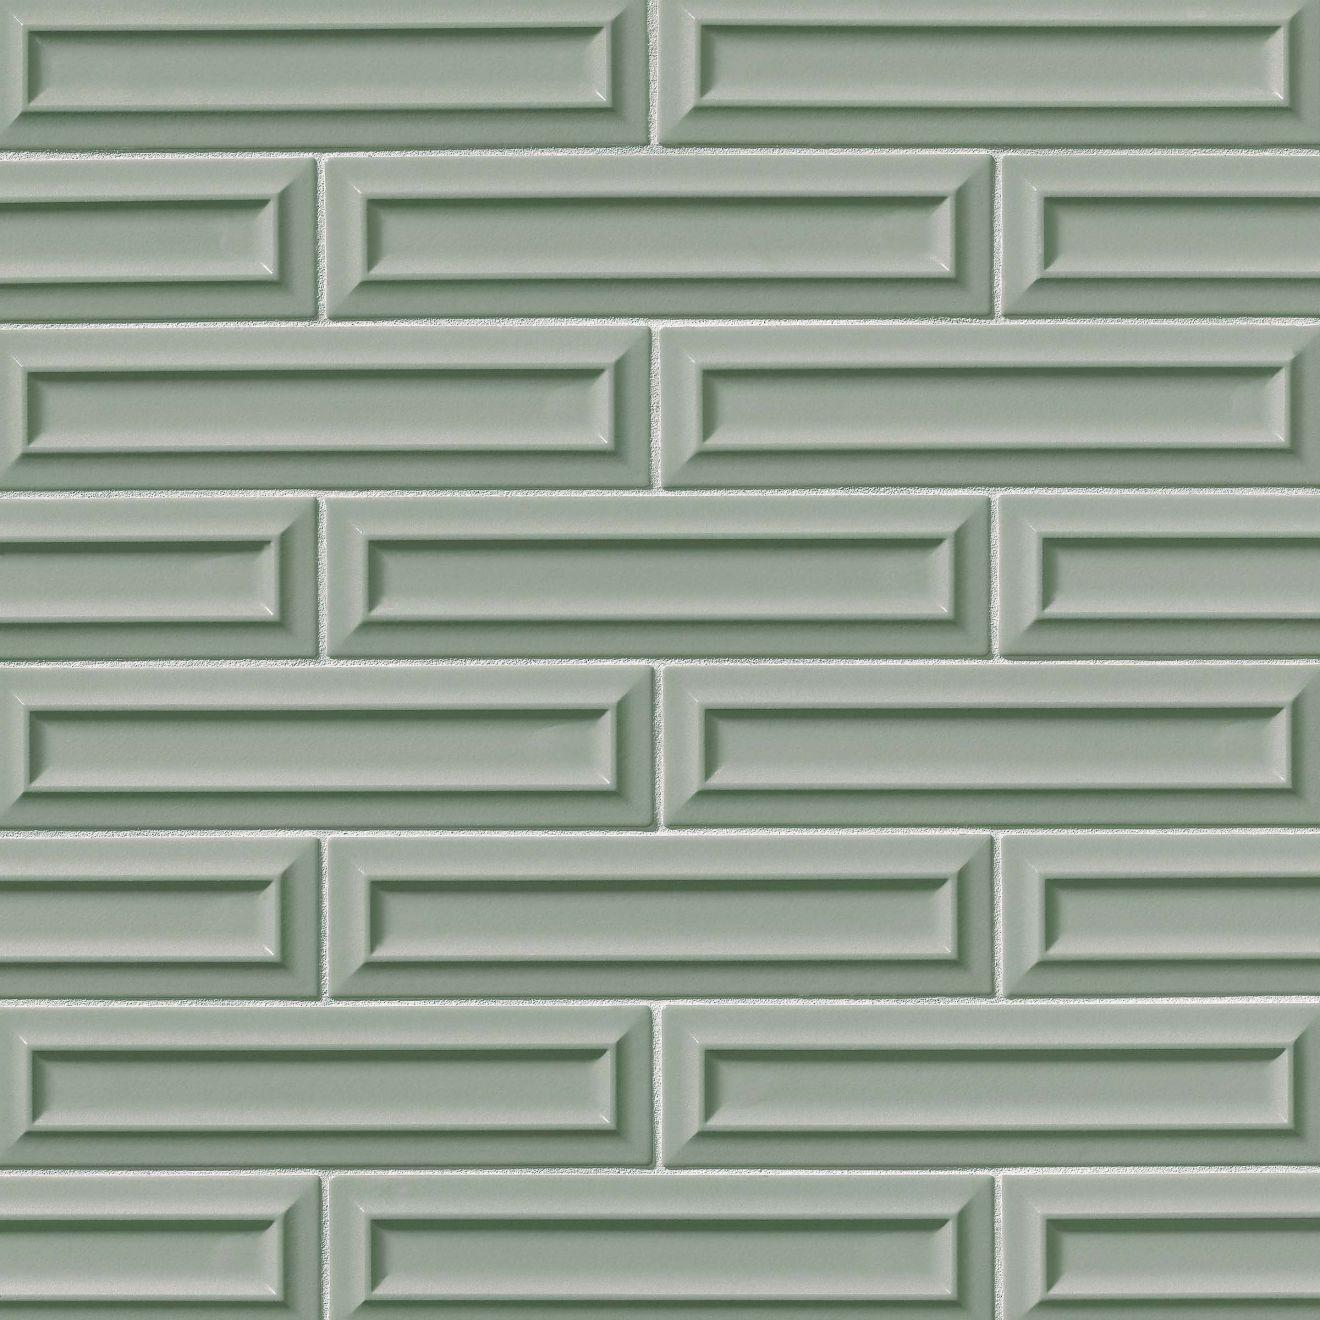 "Costa Allegra 3"" x 12"" Decorative Tile in Gulf"